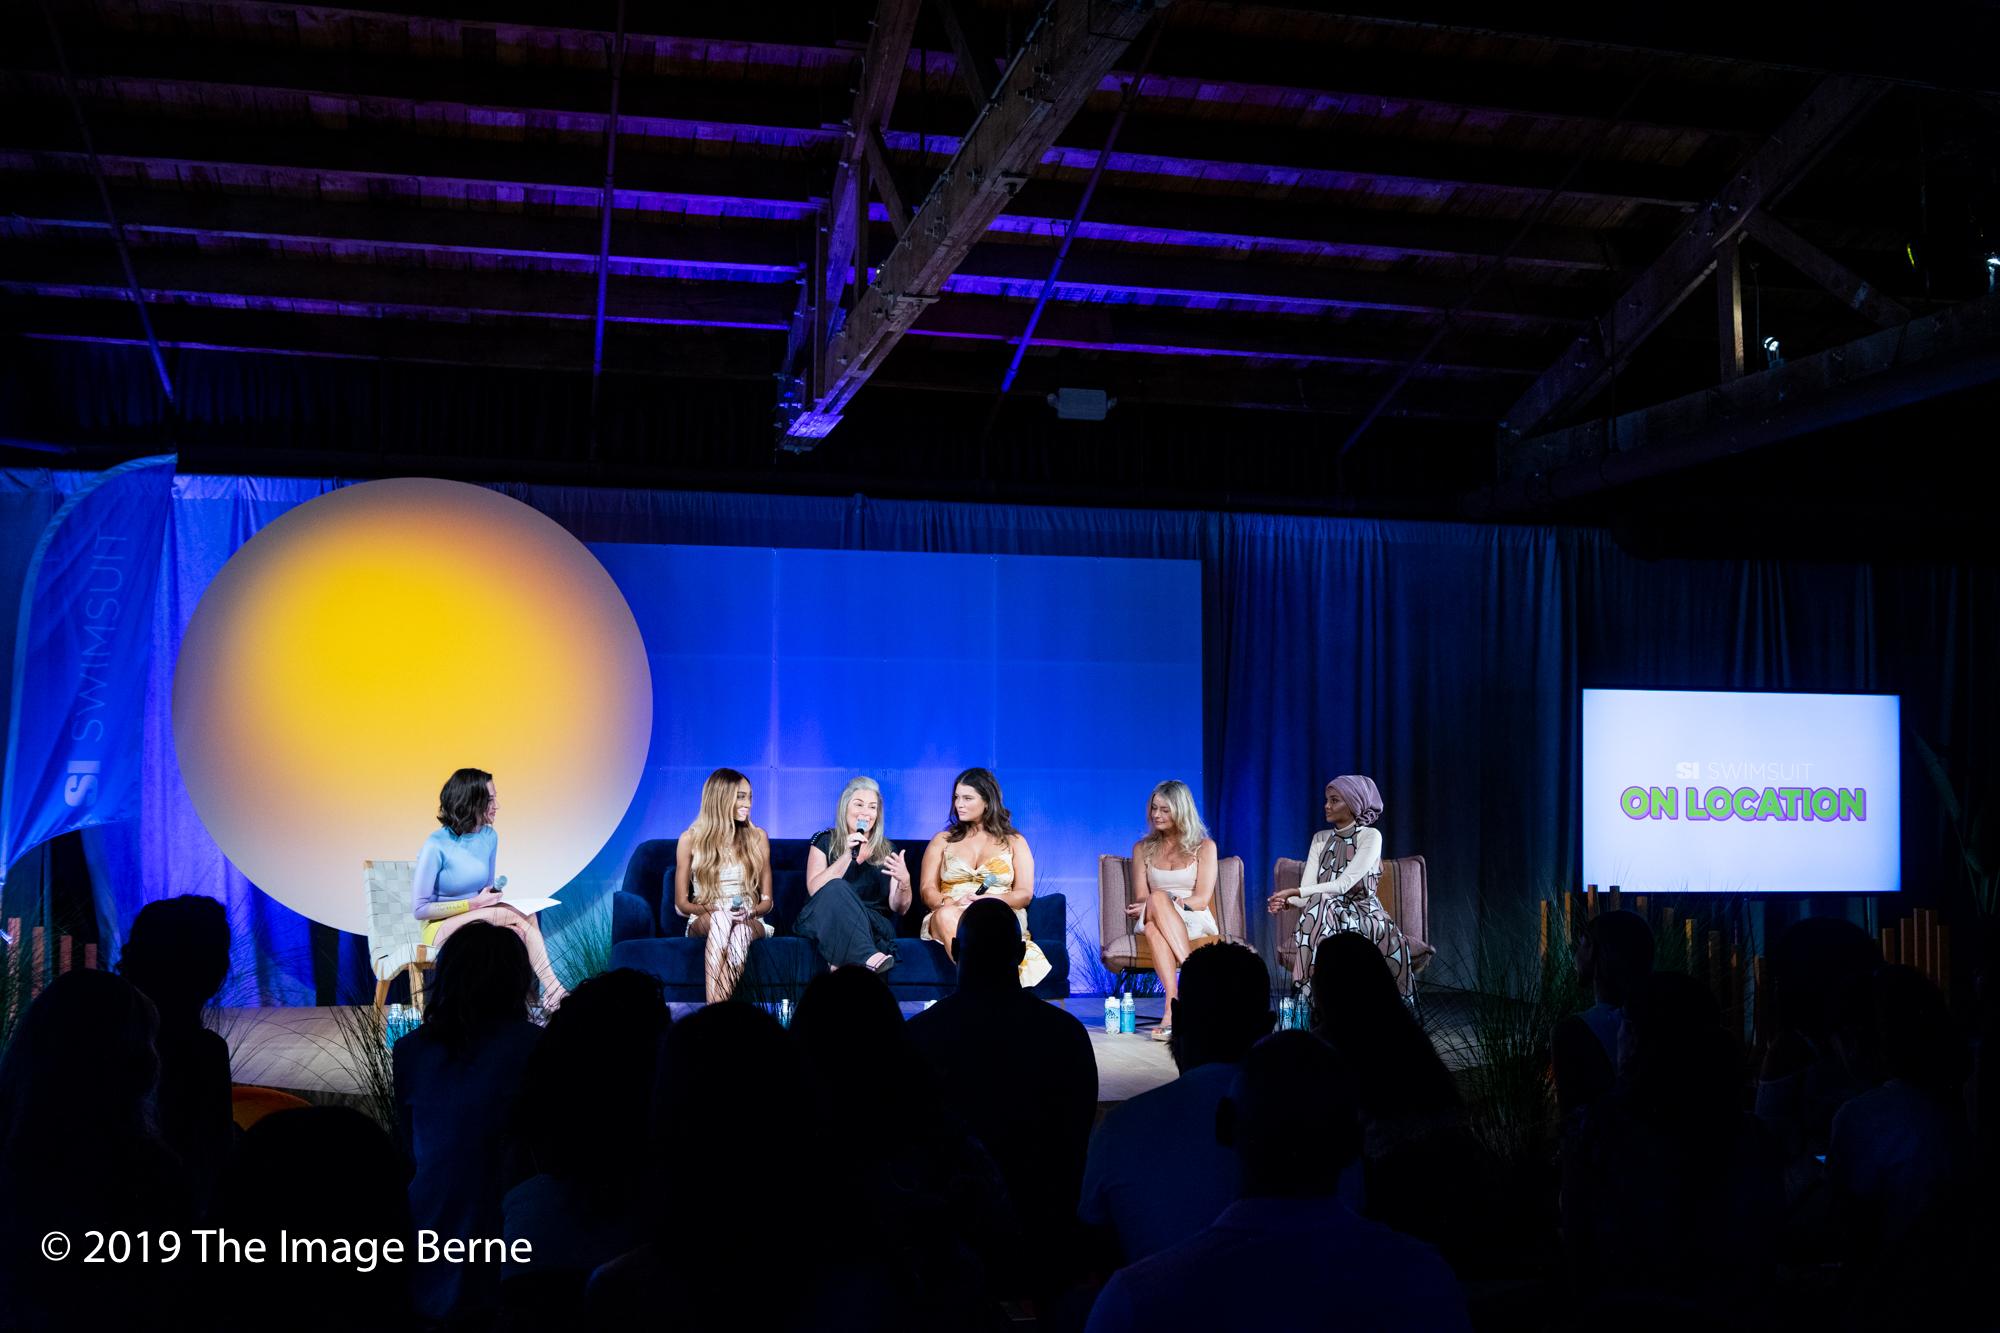 Cynthia Rowley, Winnie Harlow, MJ Day, MJ Day, Tara Lynn, Paulina Porizkova and Halima Aden-070.JPG